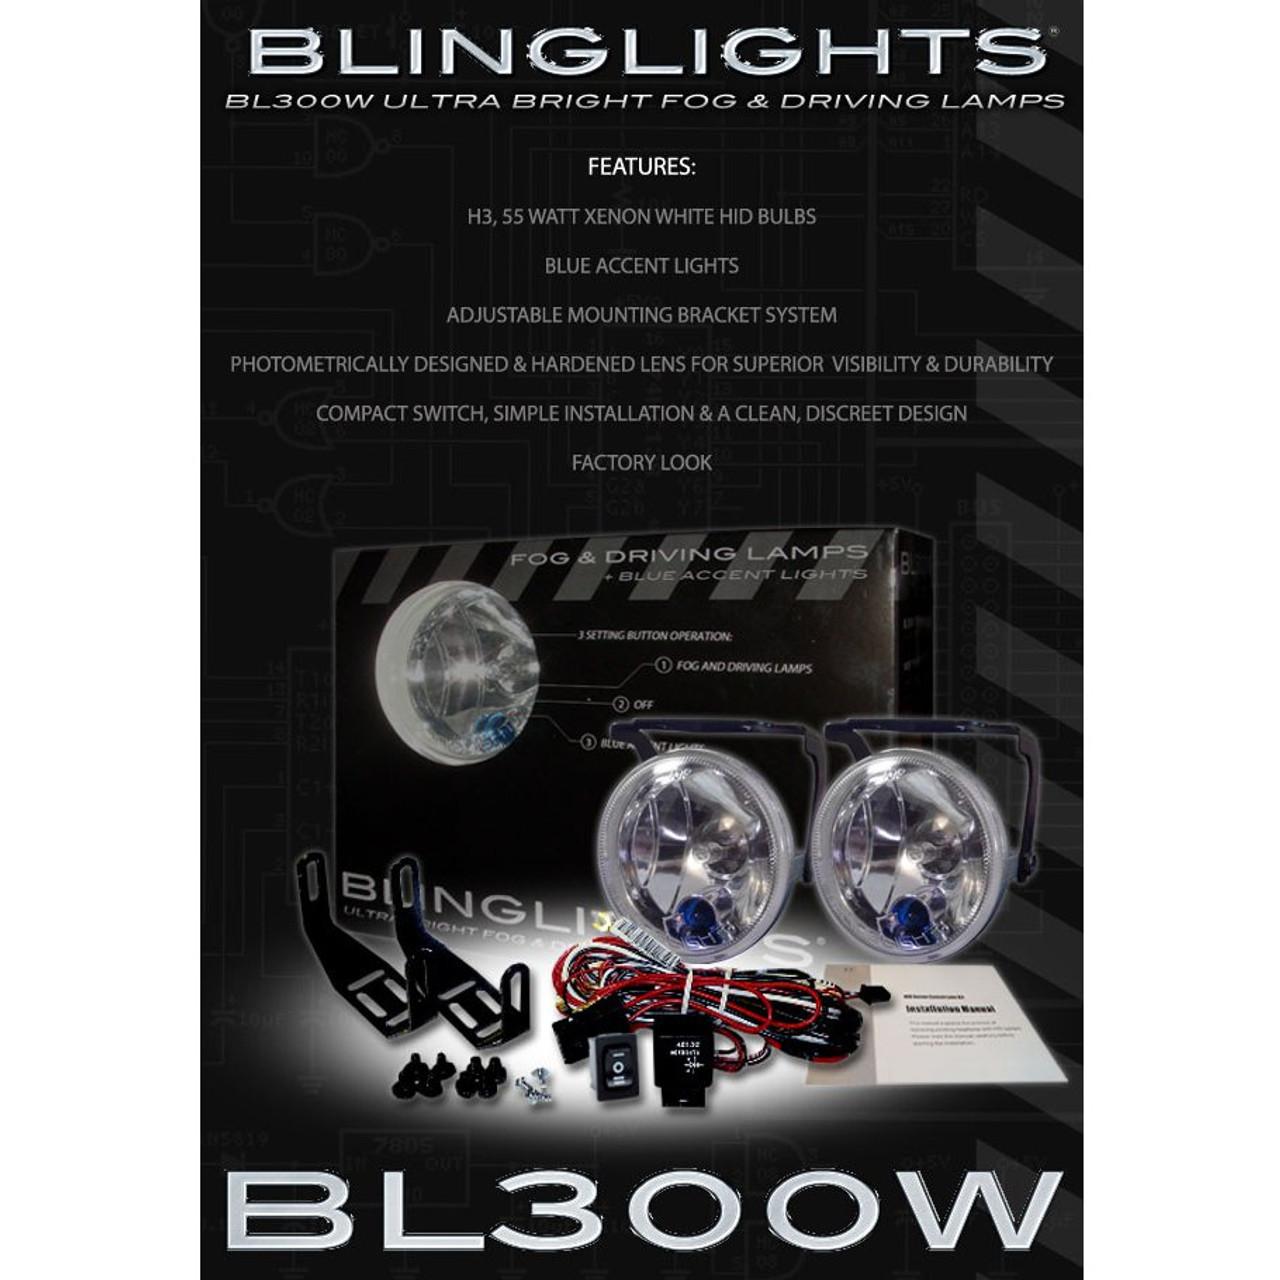 1999 2000 2001 2002 2003 2004 2005 2006 2007 Ford F550 Super Duty Xenon Fog Lamps Lights Foglamp Kit